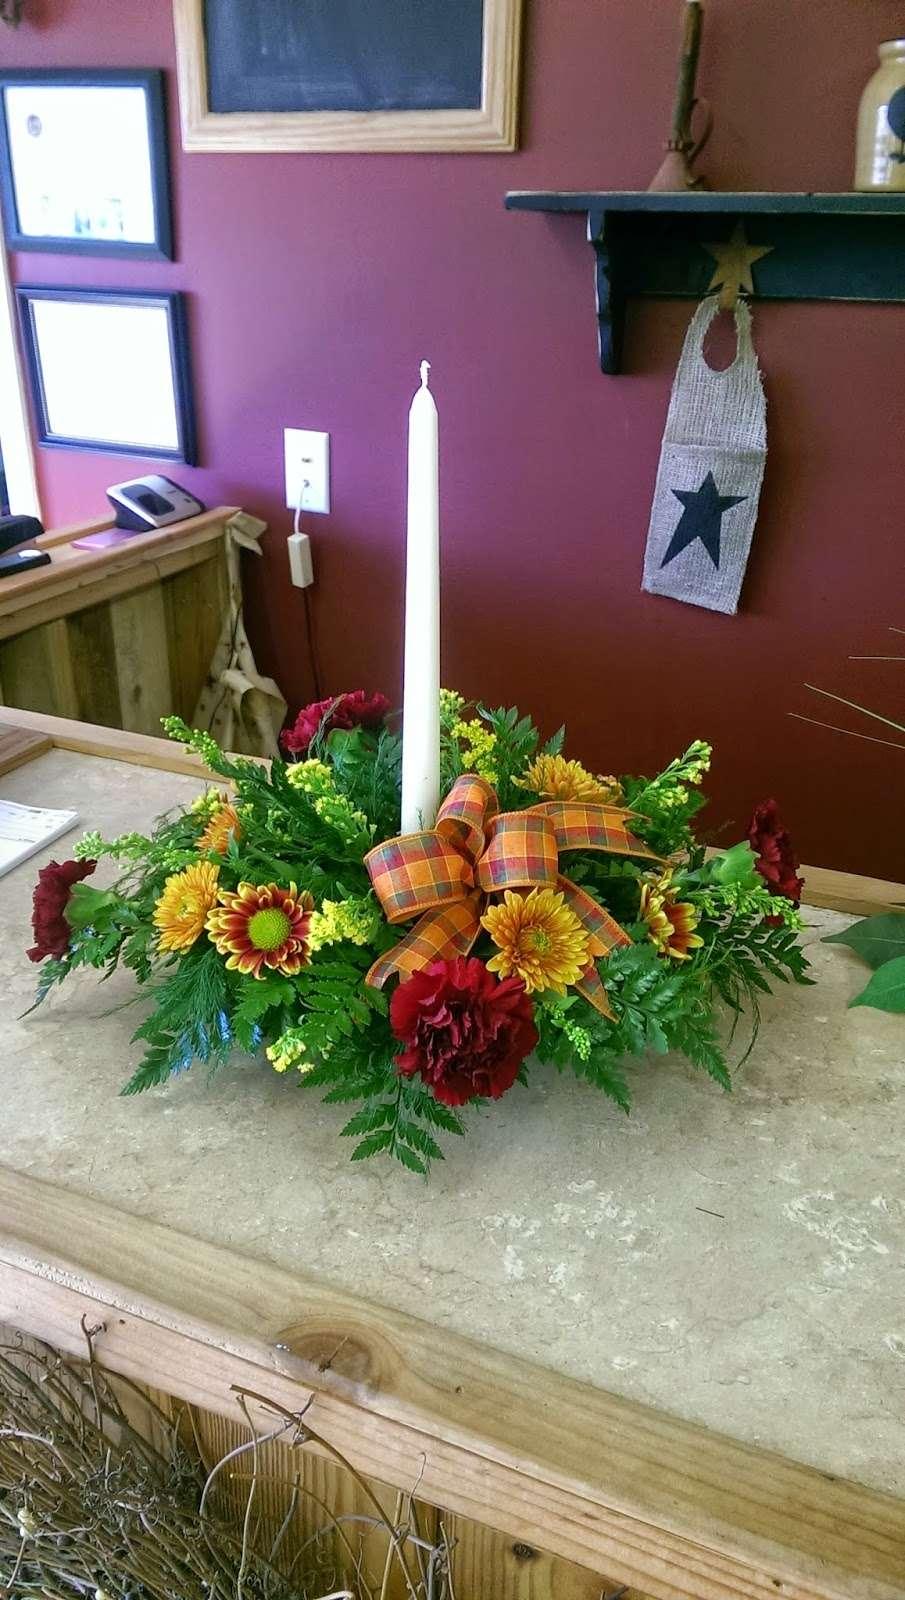 Main Street Flowers - florist    Photo 3 of 4   Address: 10 N 7th St, Crisfield, MD 21817, USA   Phone: (410) 968-0907